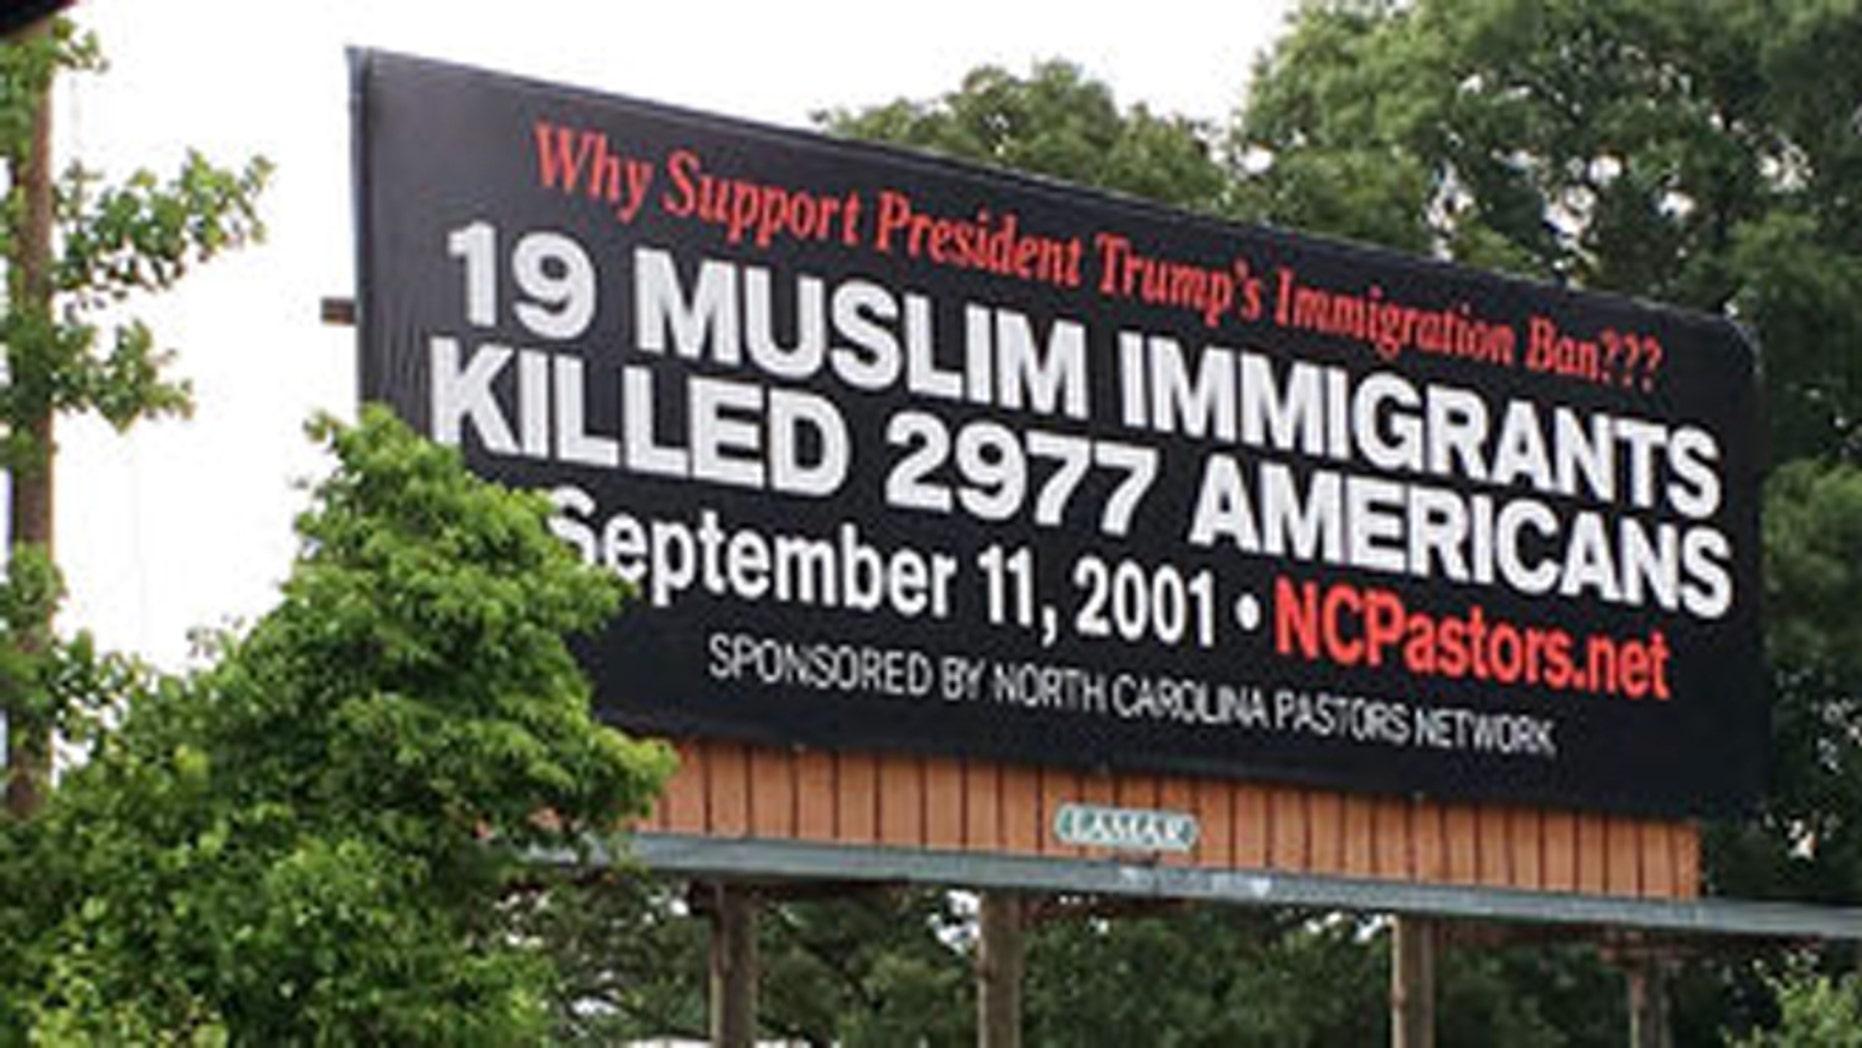 This billboard greets motorists on Interstate 40 in North Carolina's Catawba County.